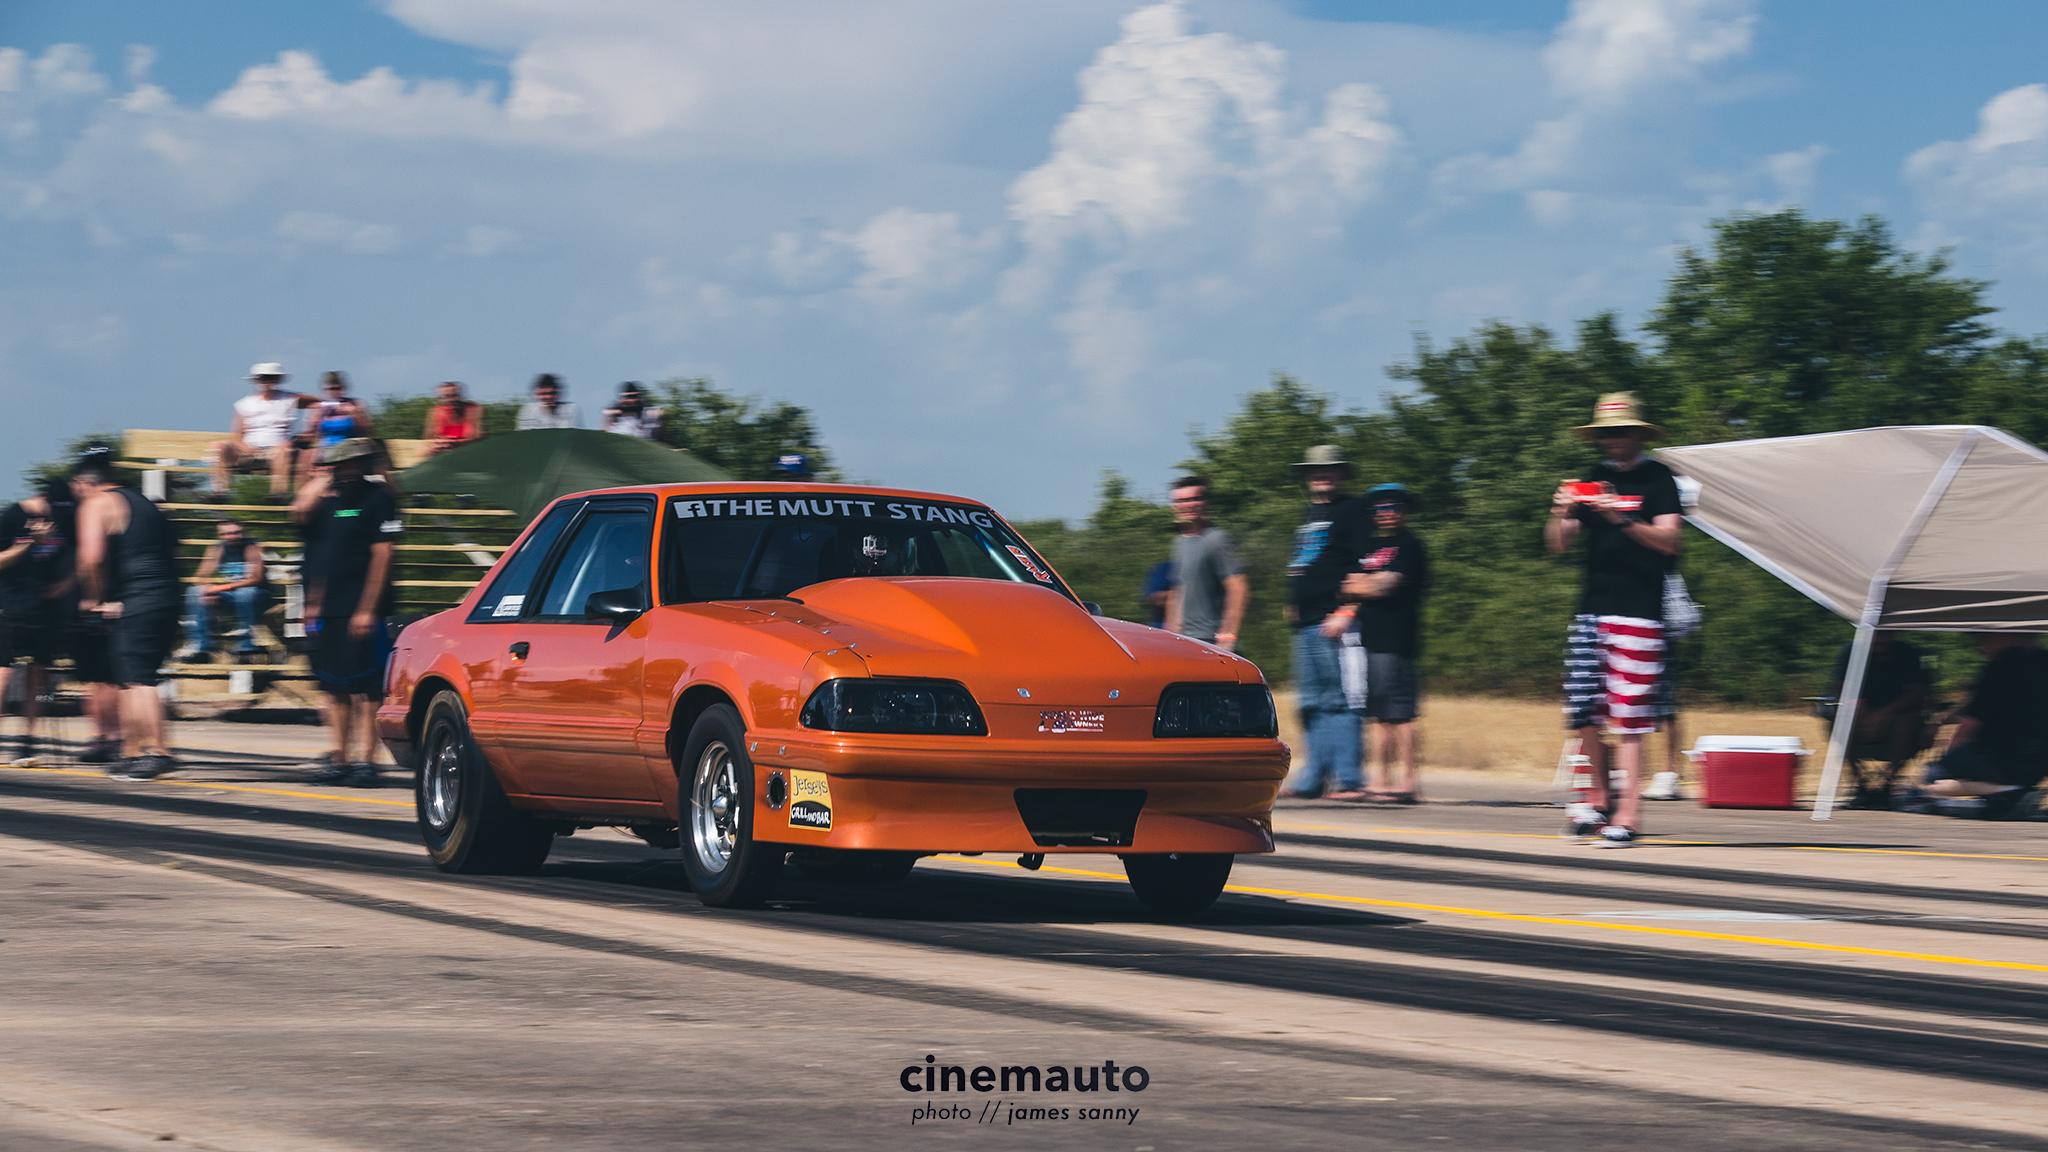 wichita-automotive-photography-kansas-racecar-16.jpg